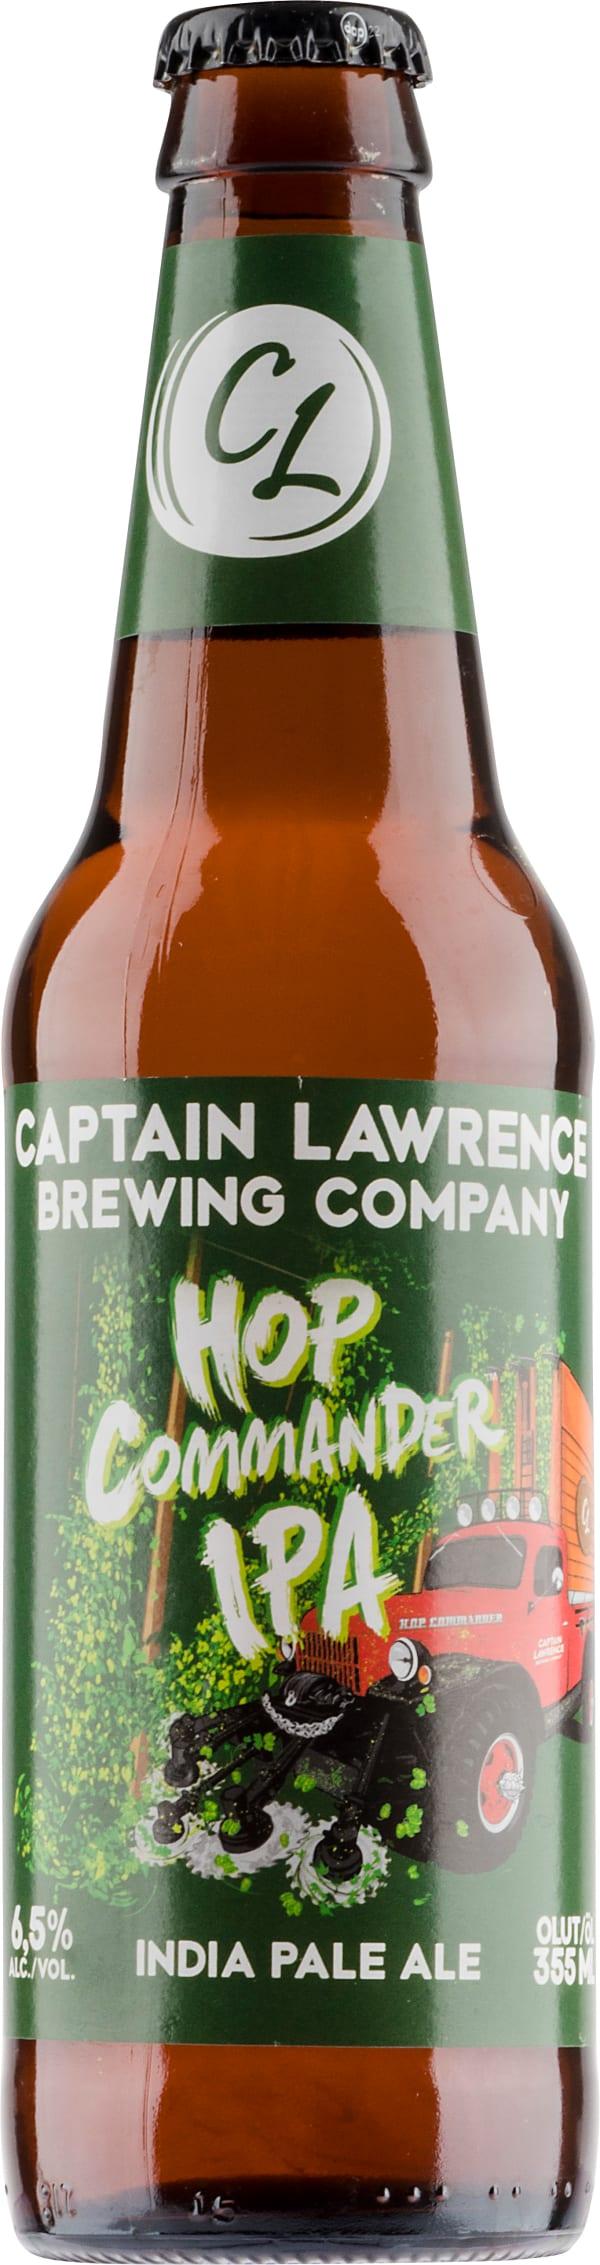 Captain Lawrence Hop Commander IPA